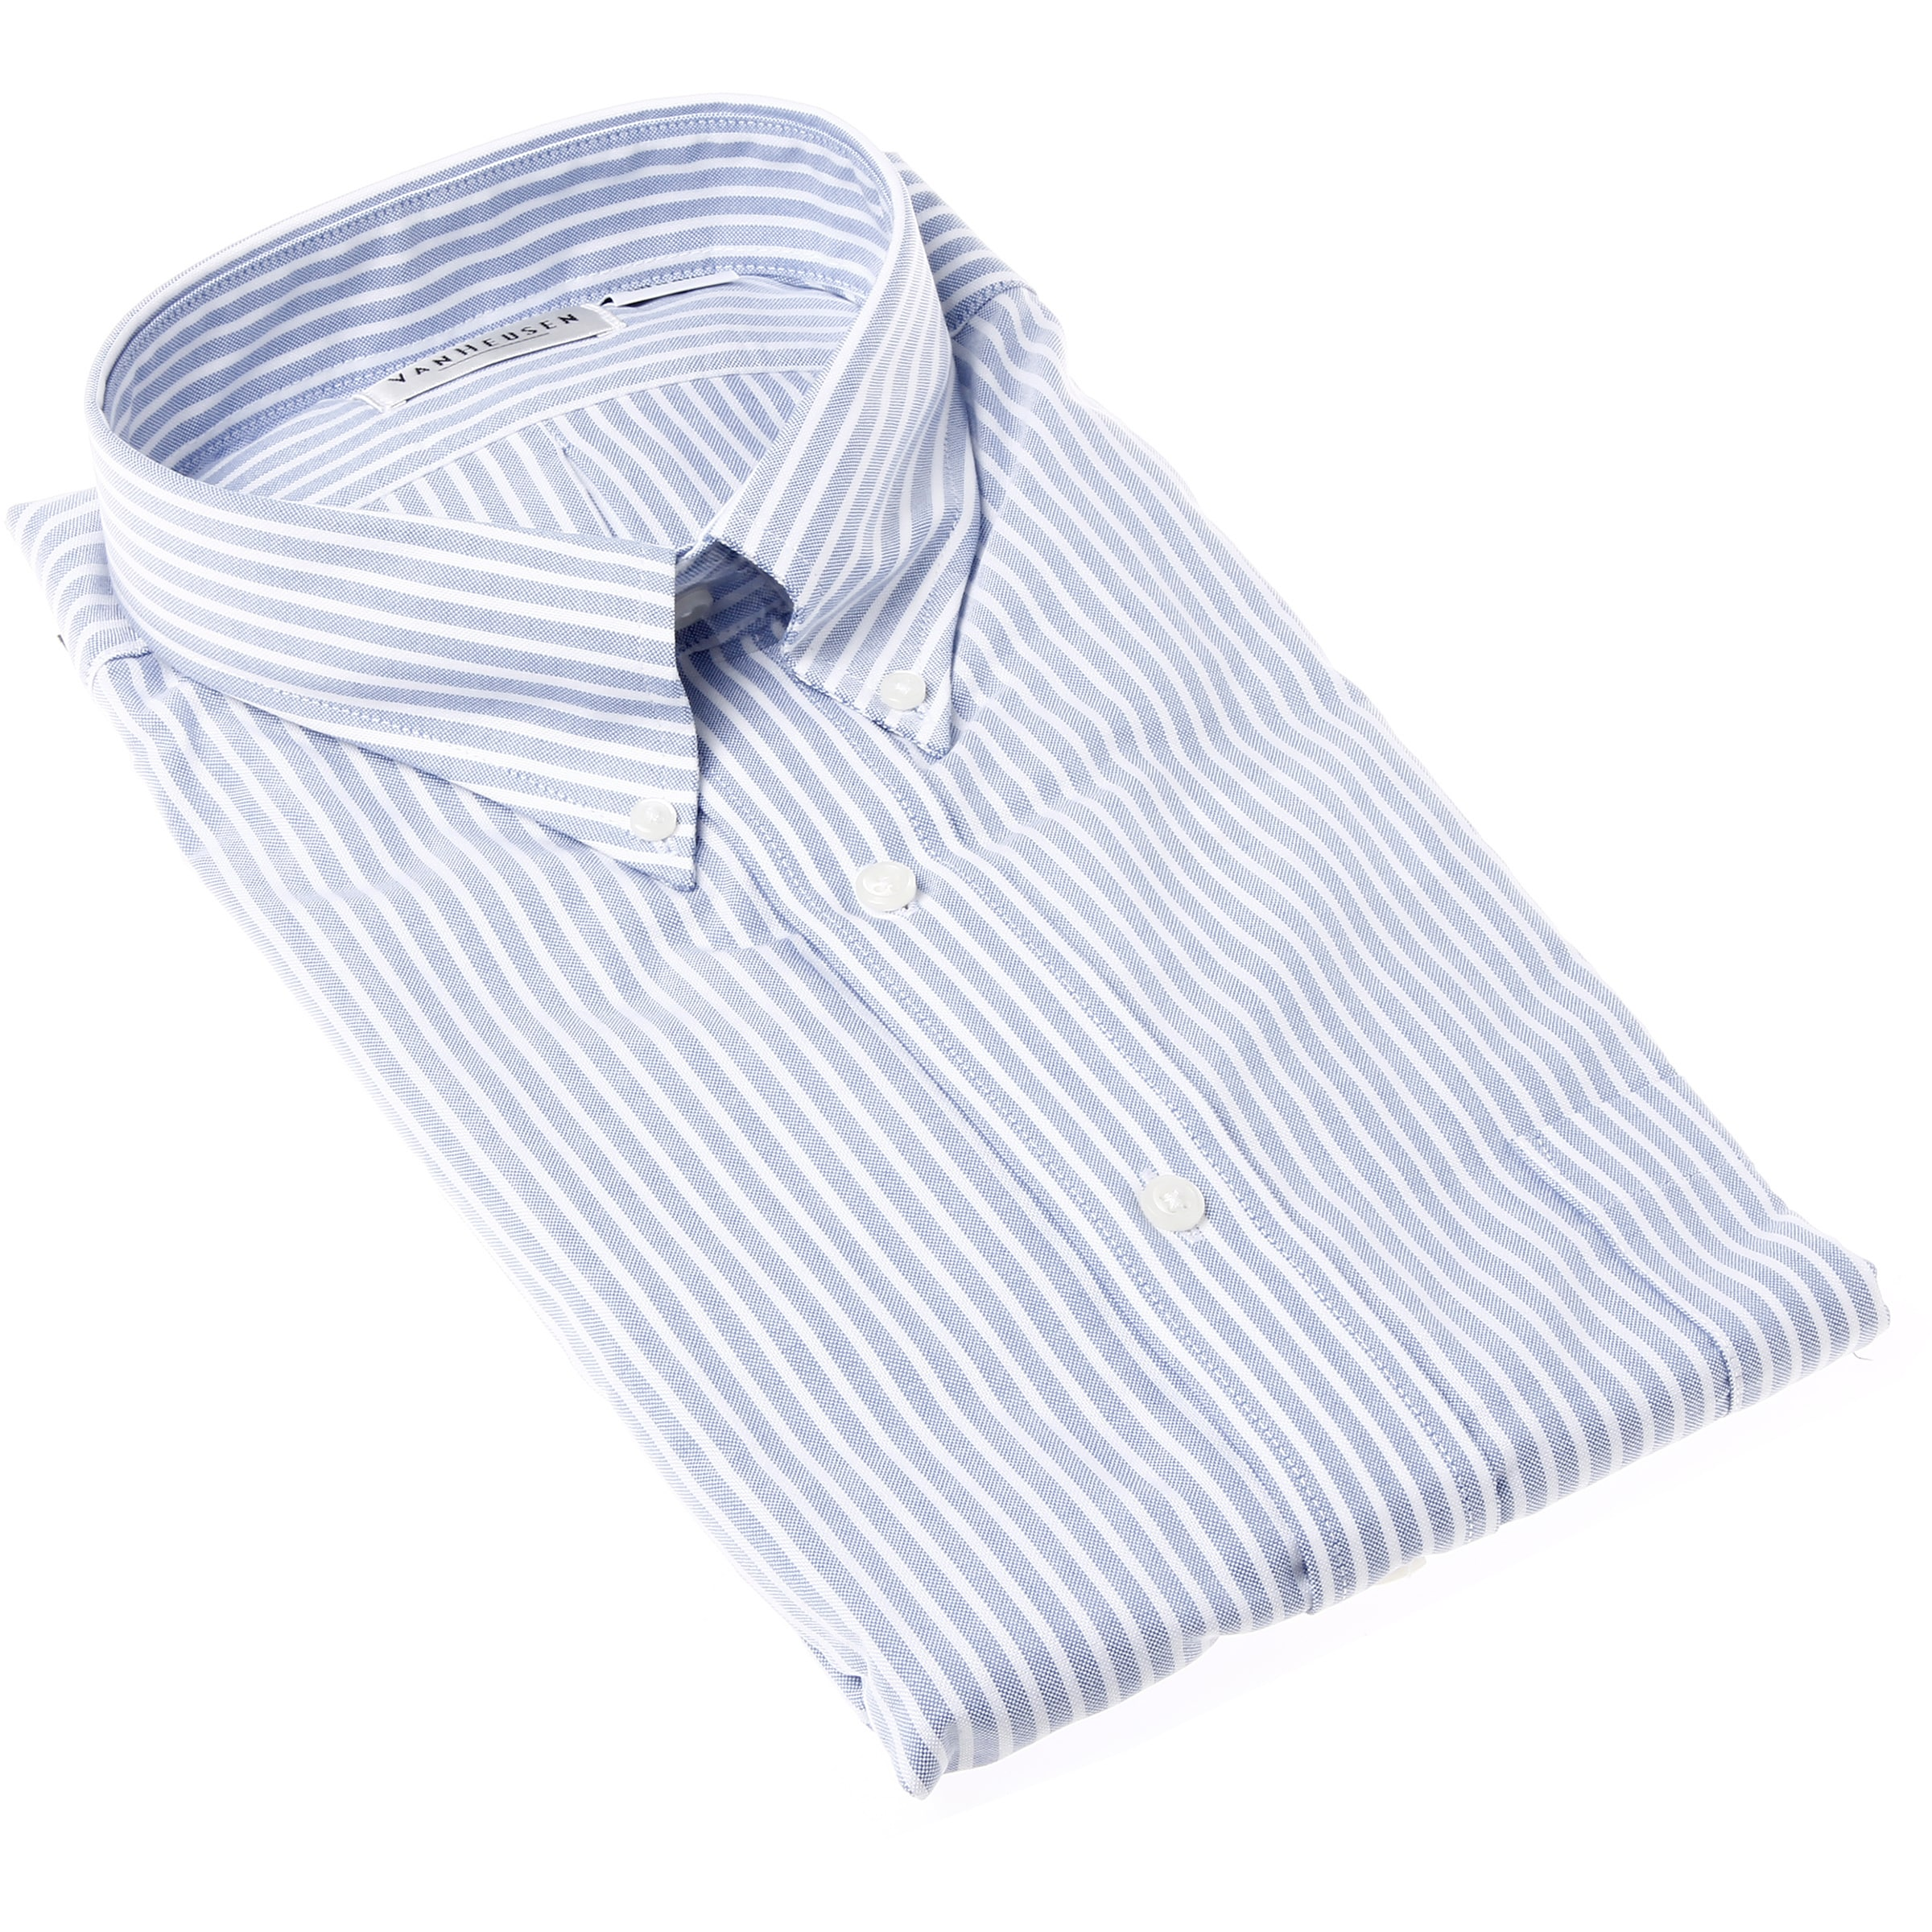 Shop Van Heusen Mens Long Sleeve Oxford Shirt Free Shipping On